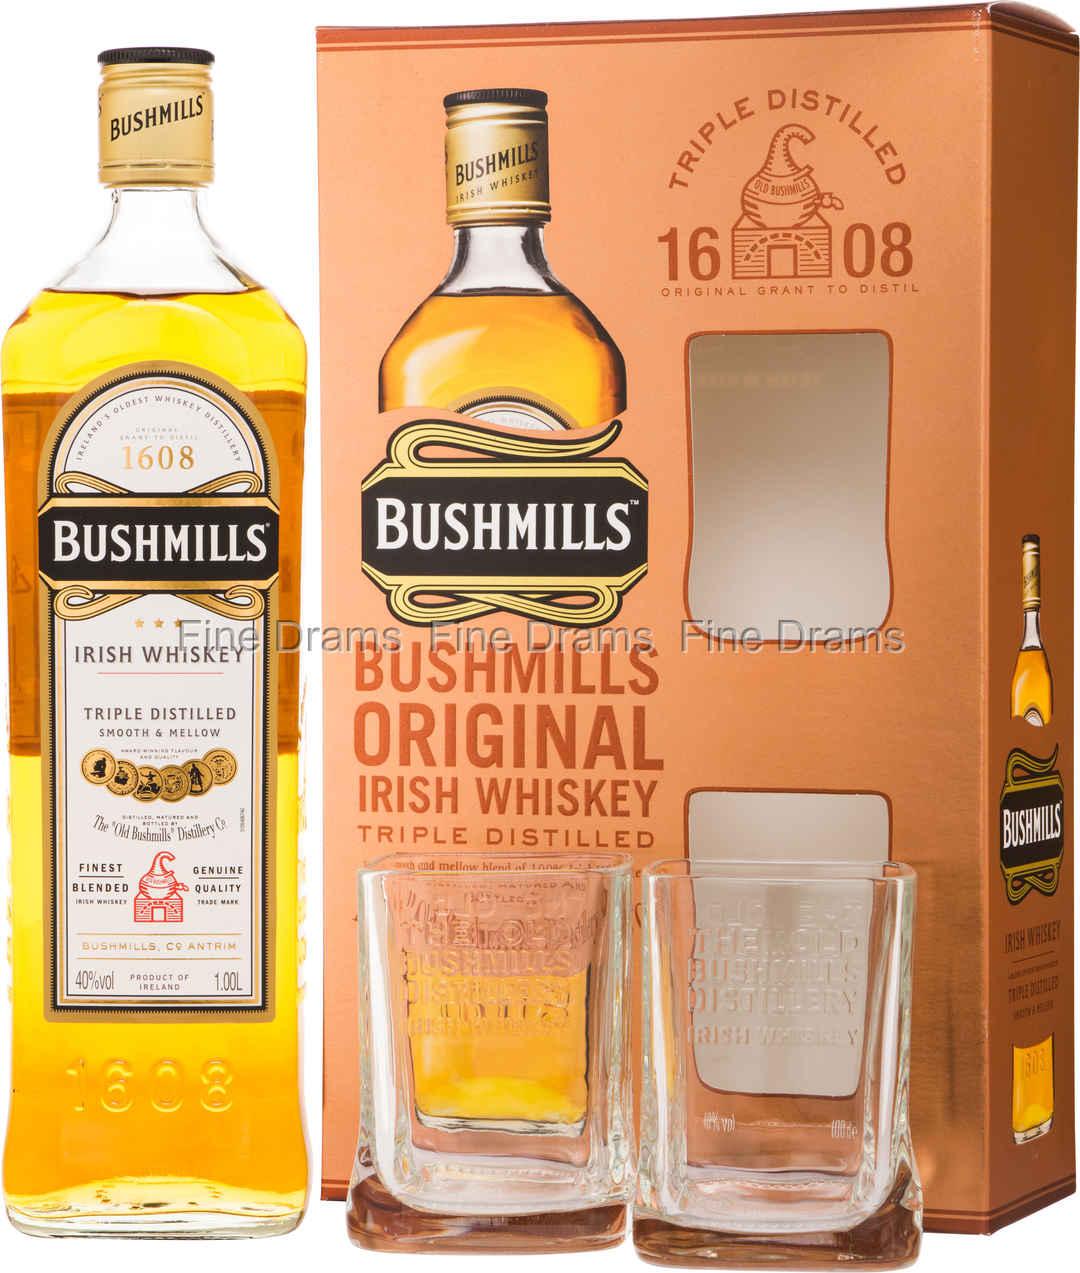 Bushmills Original (1 Liter) Gift Set - 2 Glasses